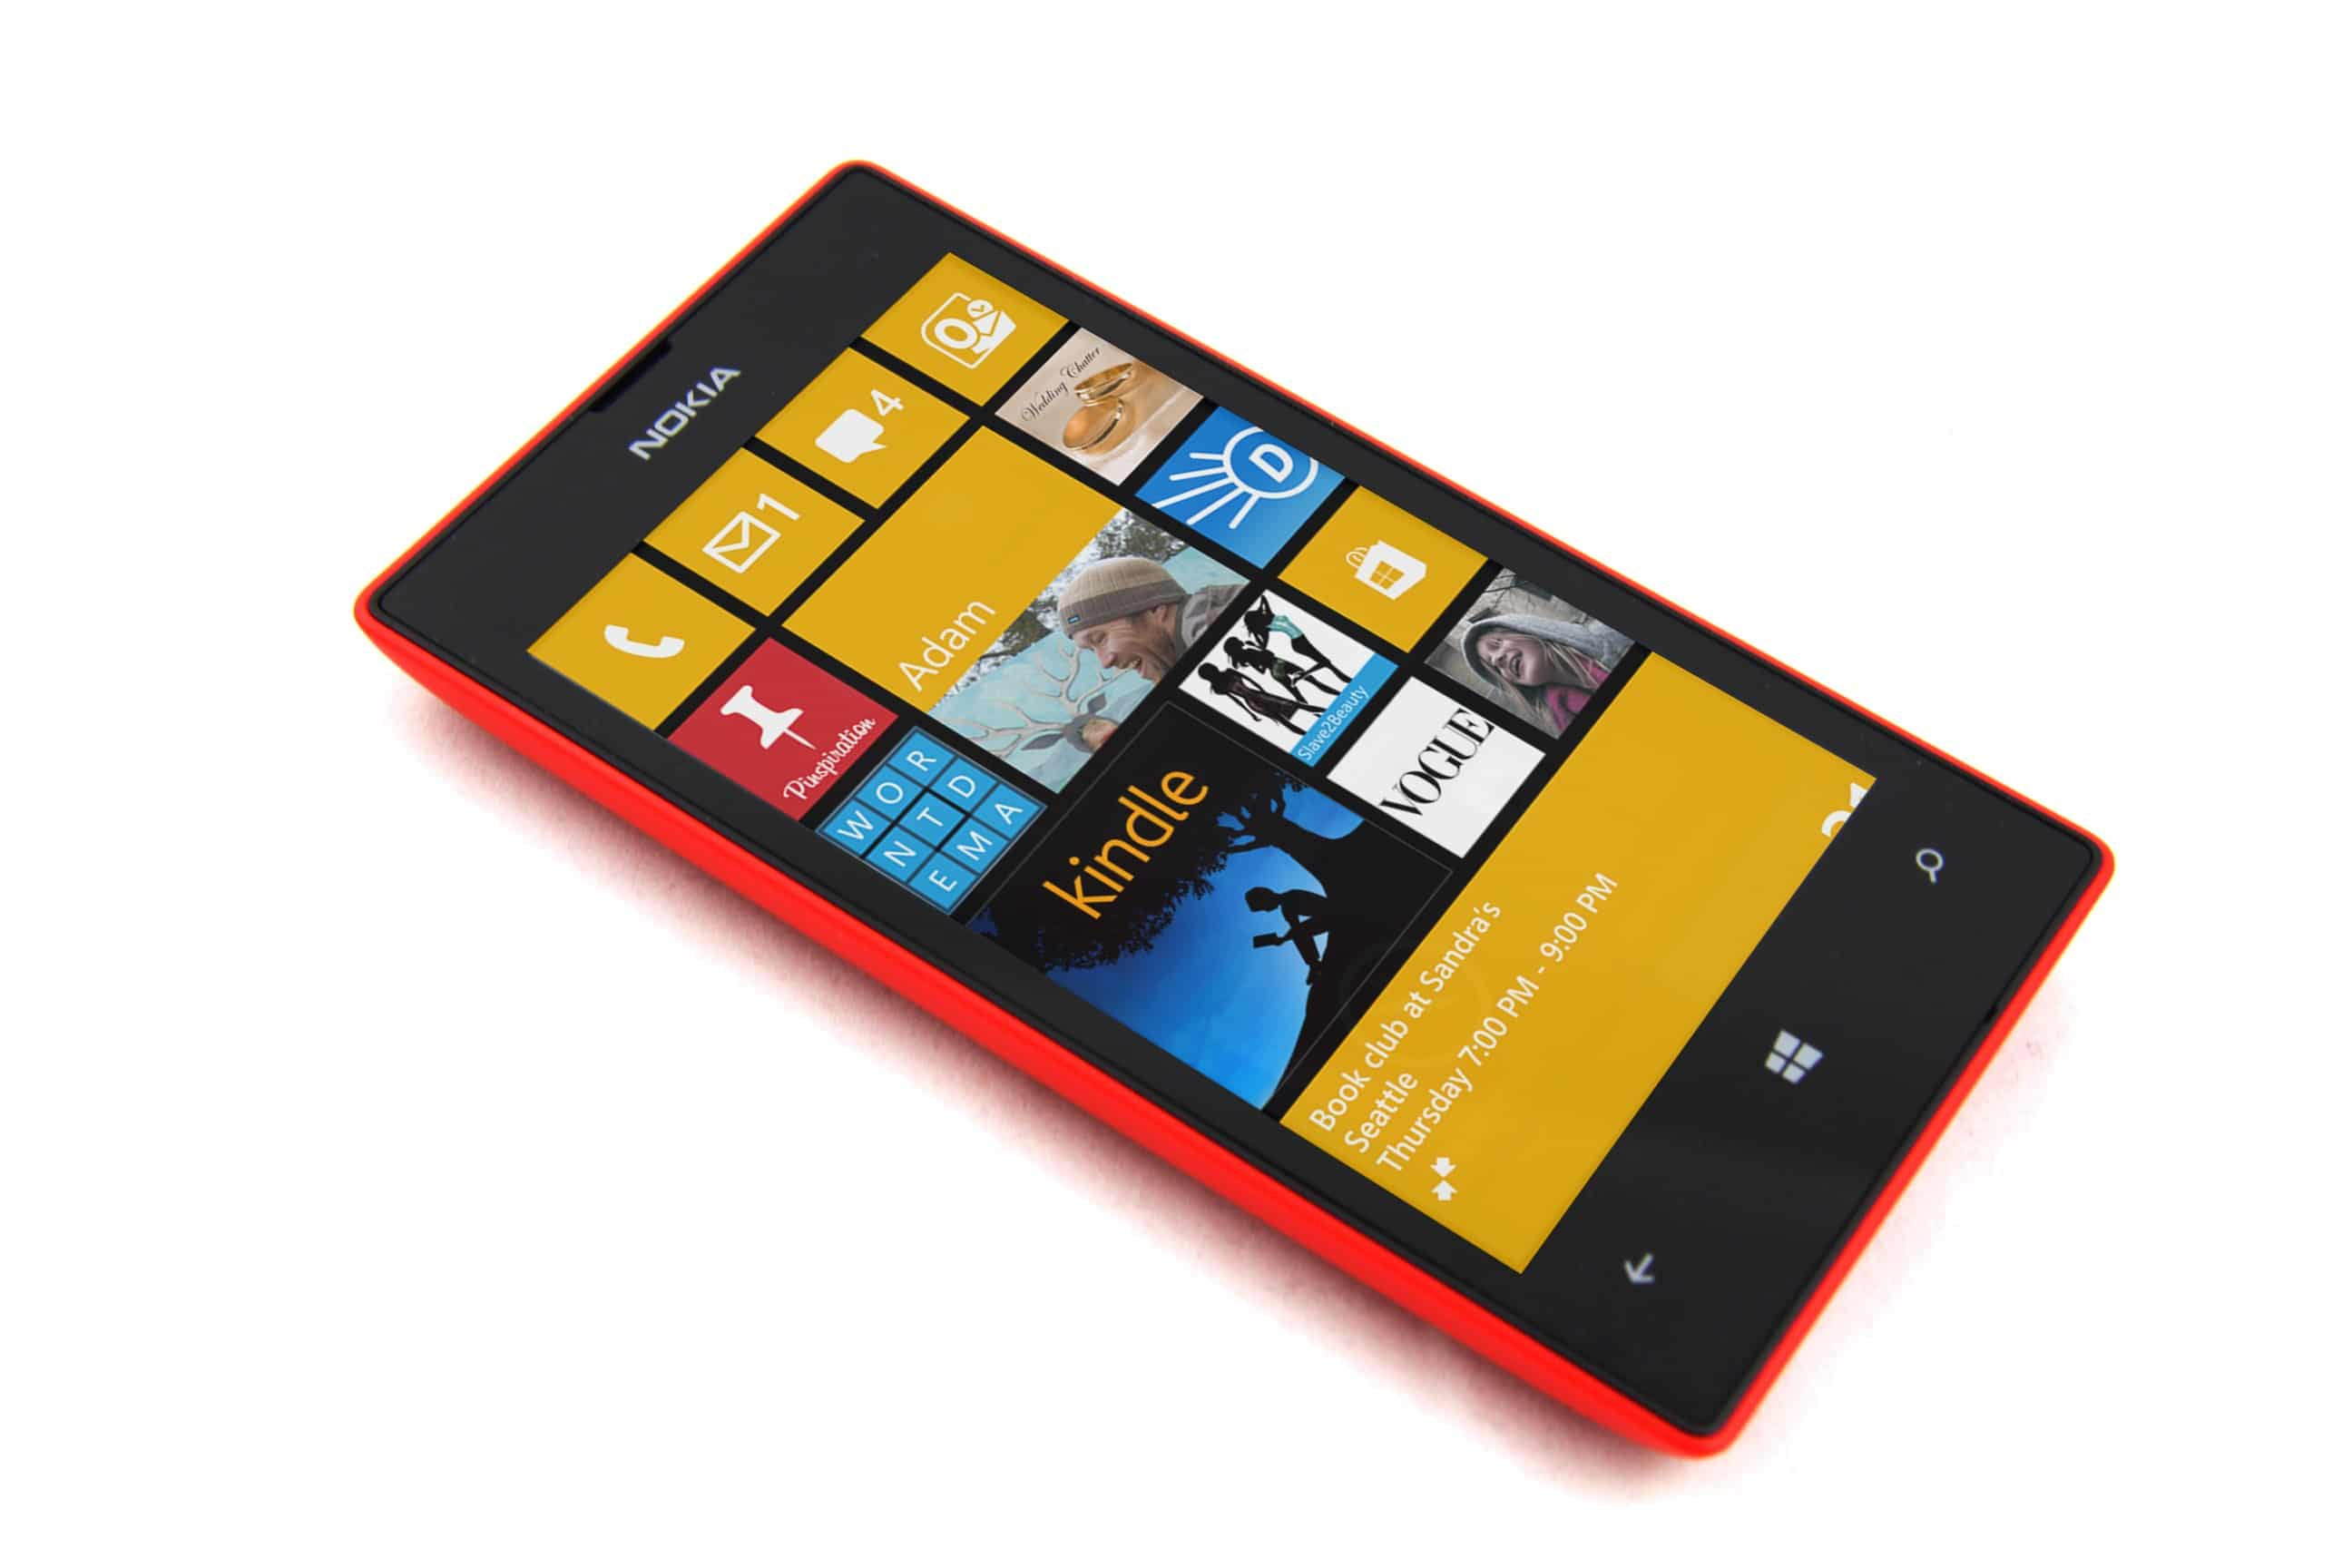 Вмагазине Microsoft нет раздела Lumia